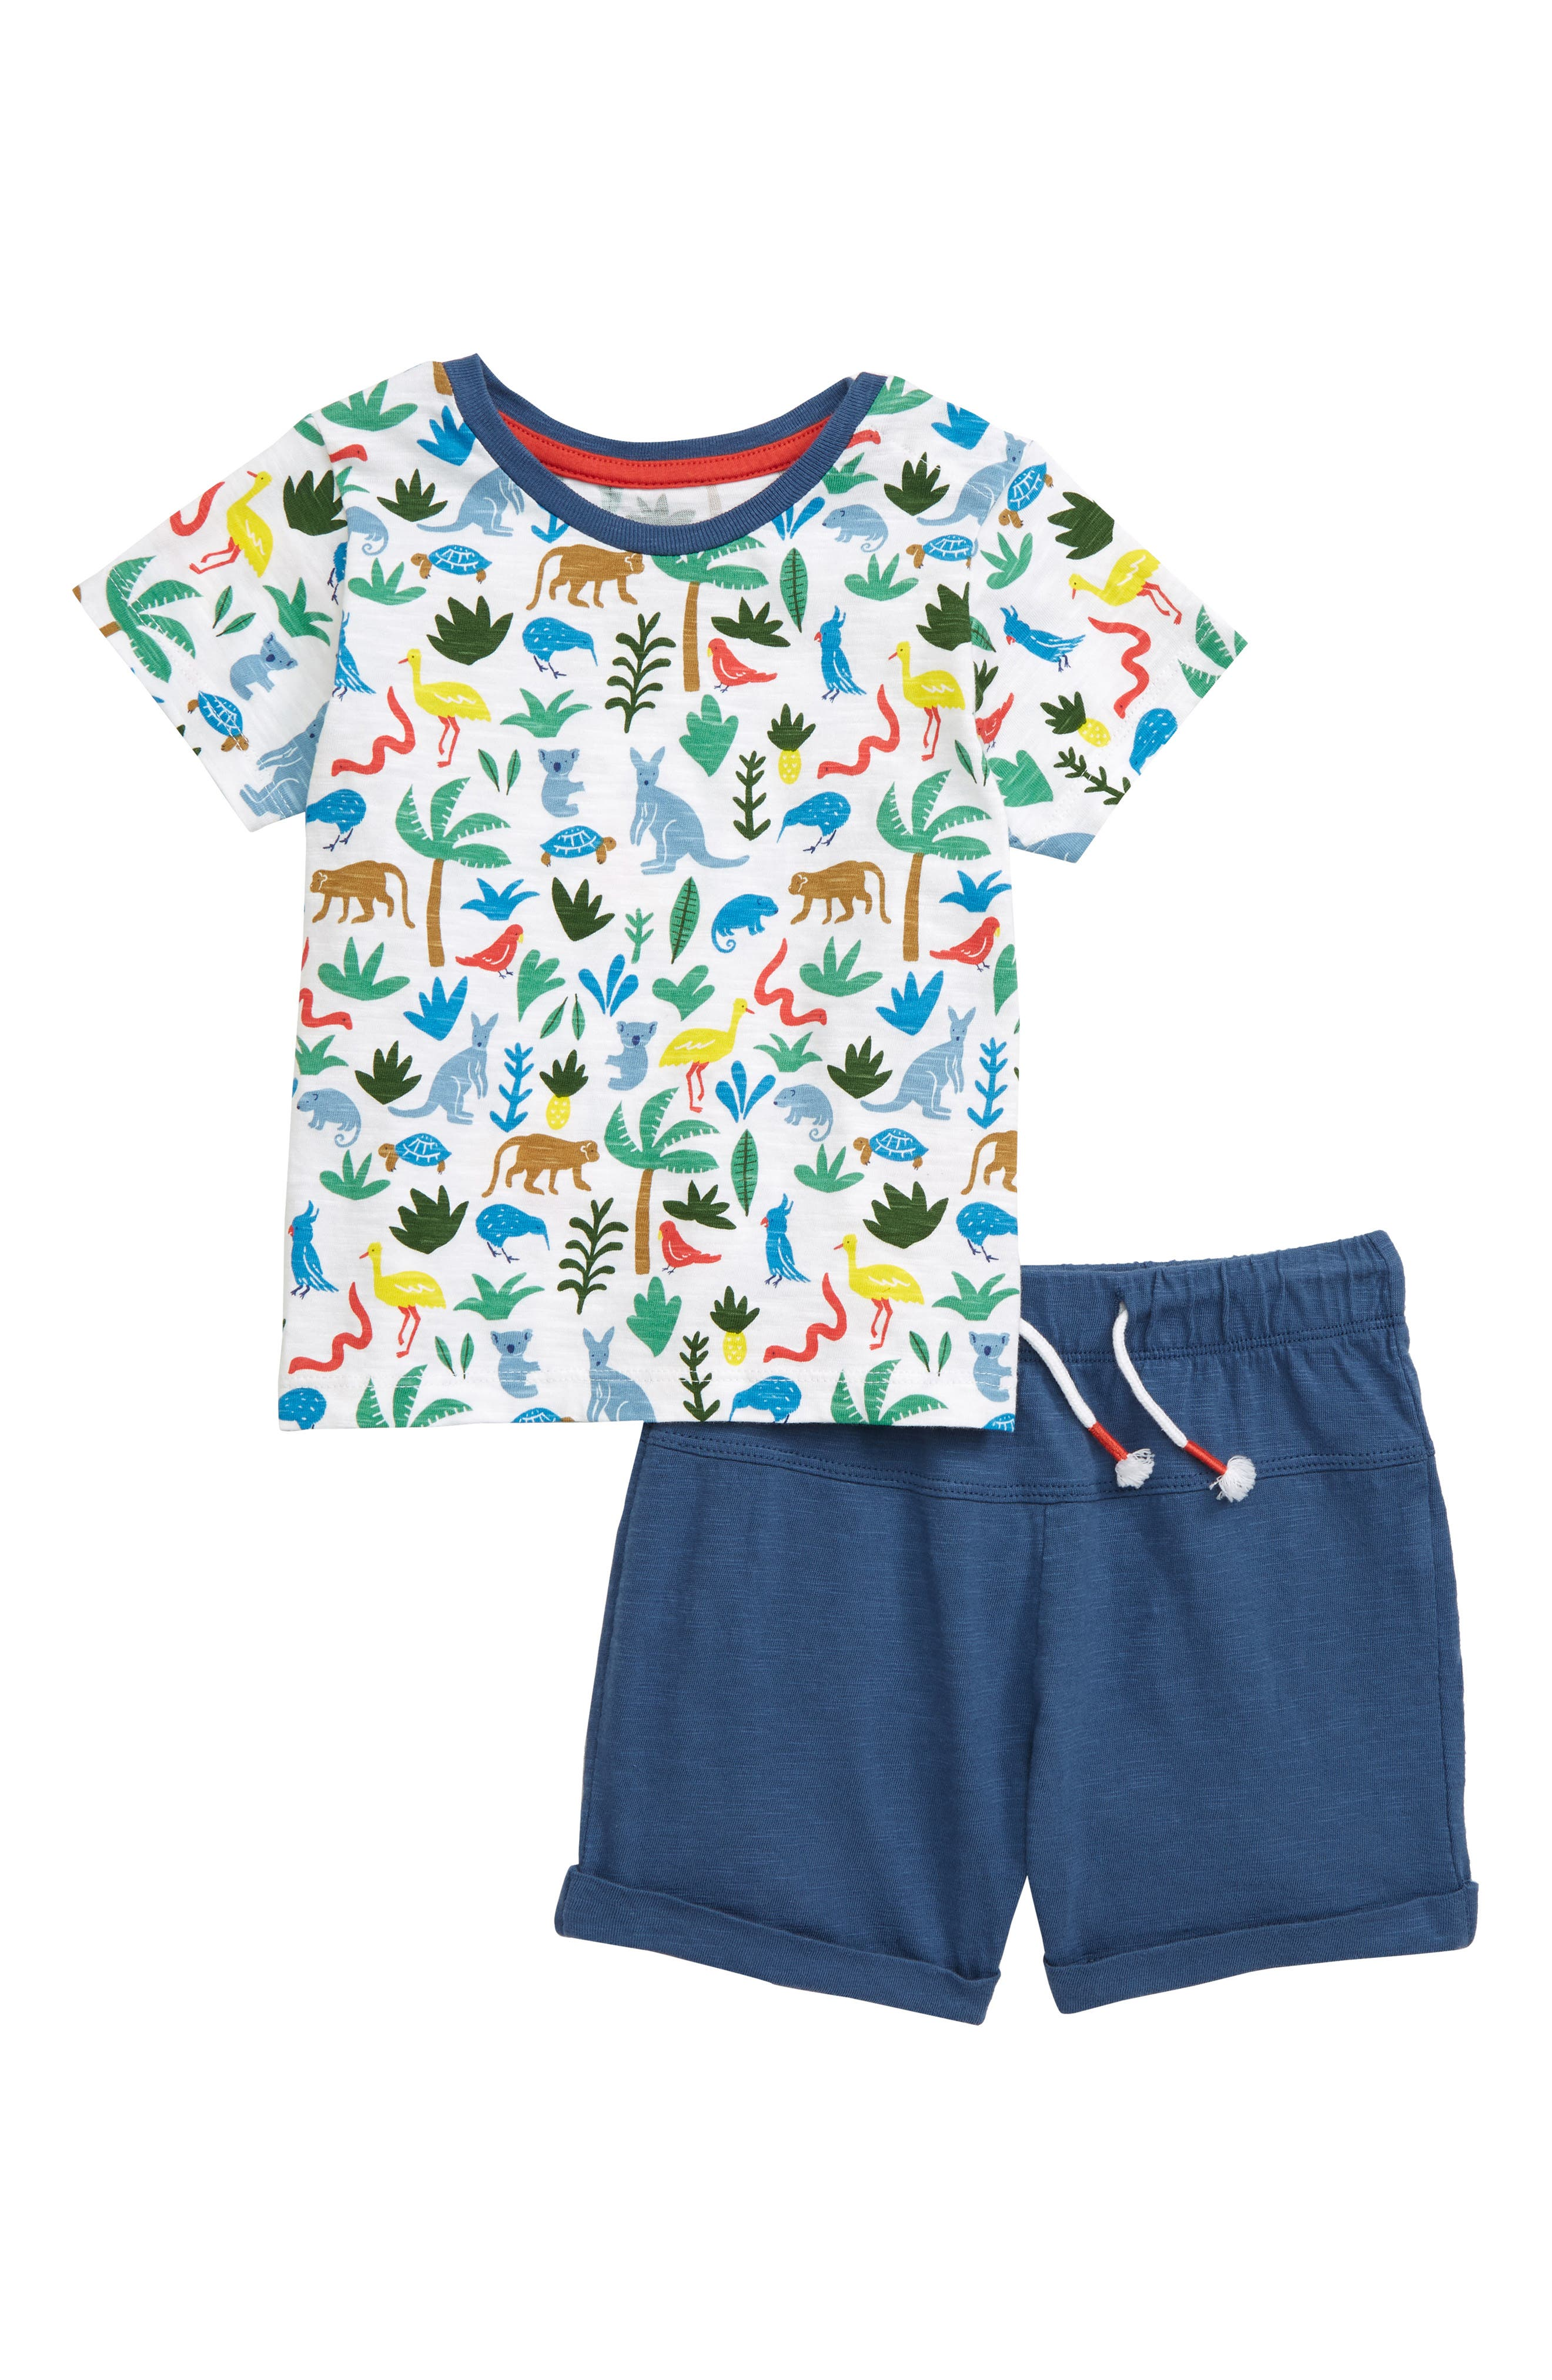 Toddler Boys Mini Boden Fun Pocket TShirt  Shorts Set (Baby  Toddler Boys)